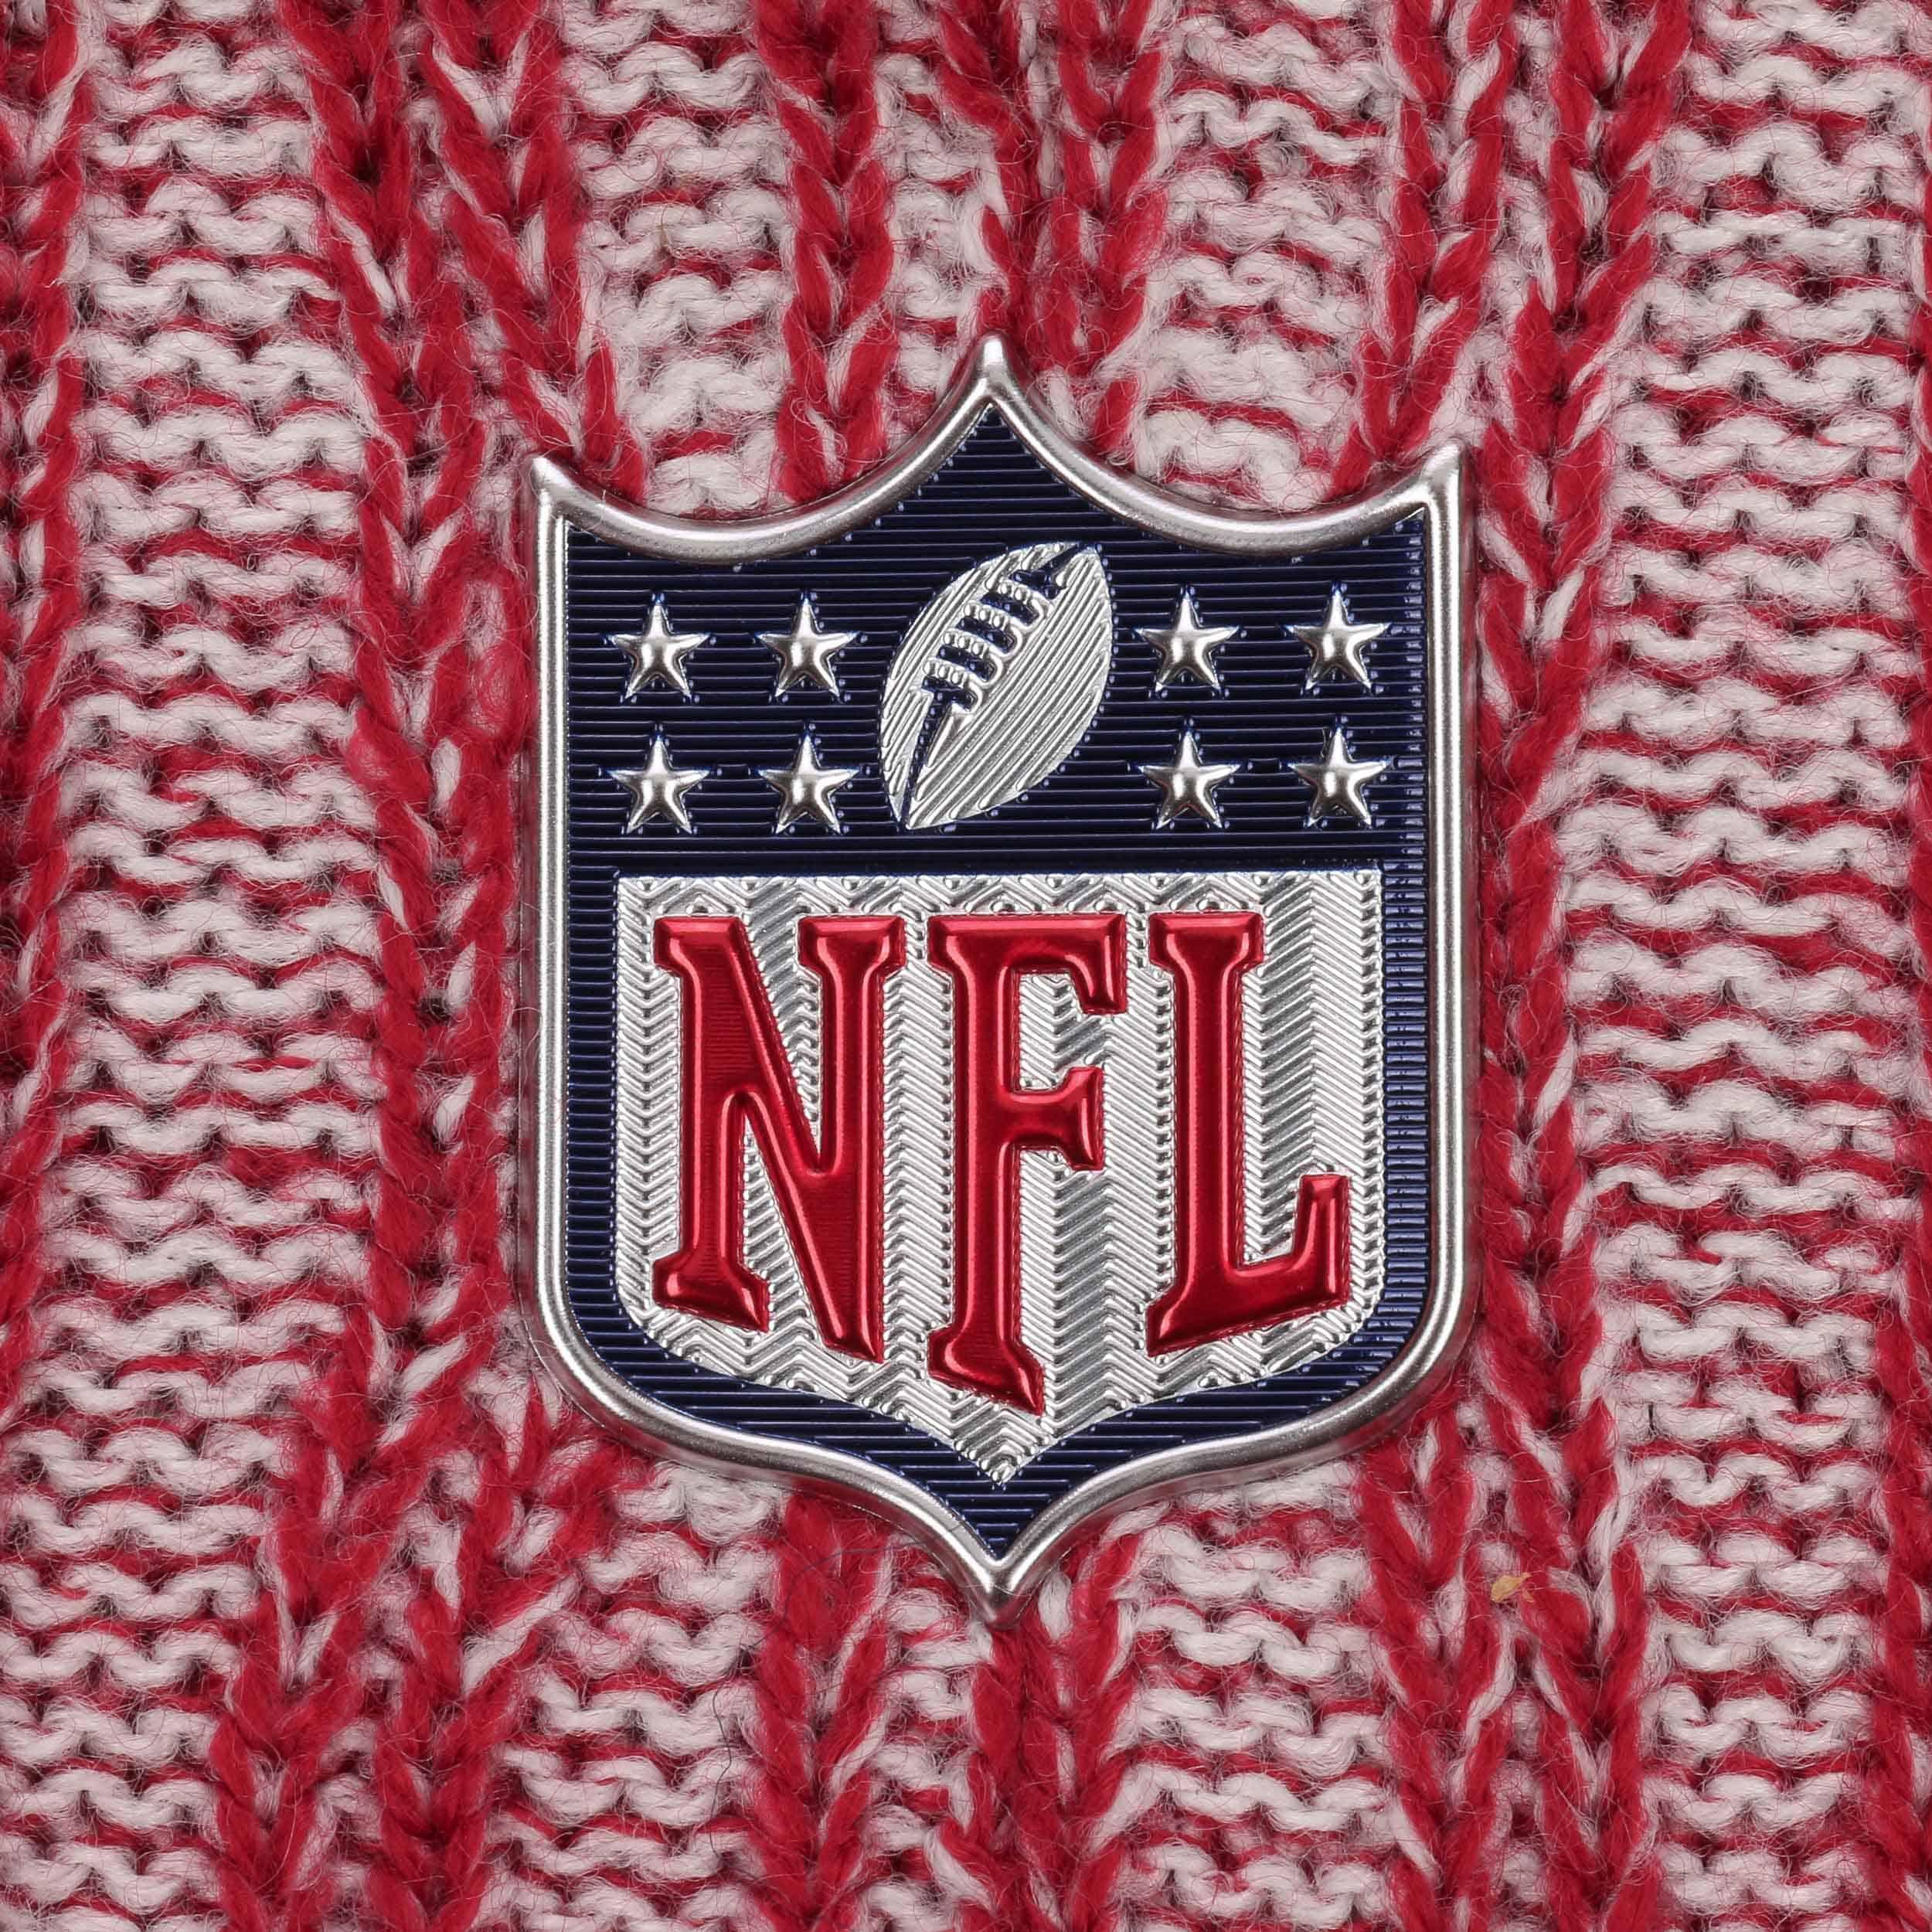 ... NFL Cardinals Beanie by New Era - red 5 11bb8406c